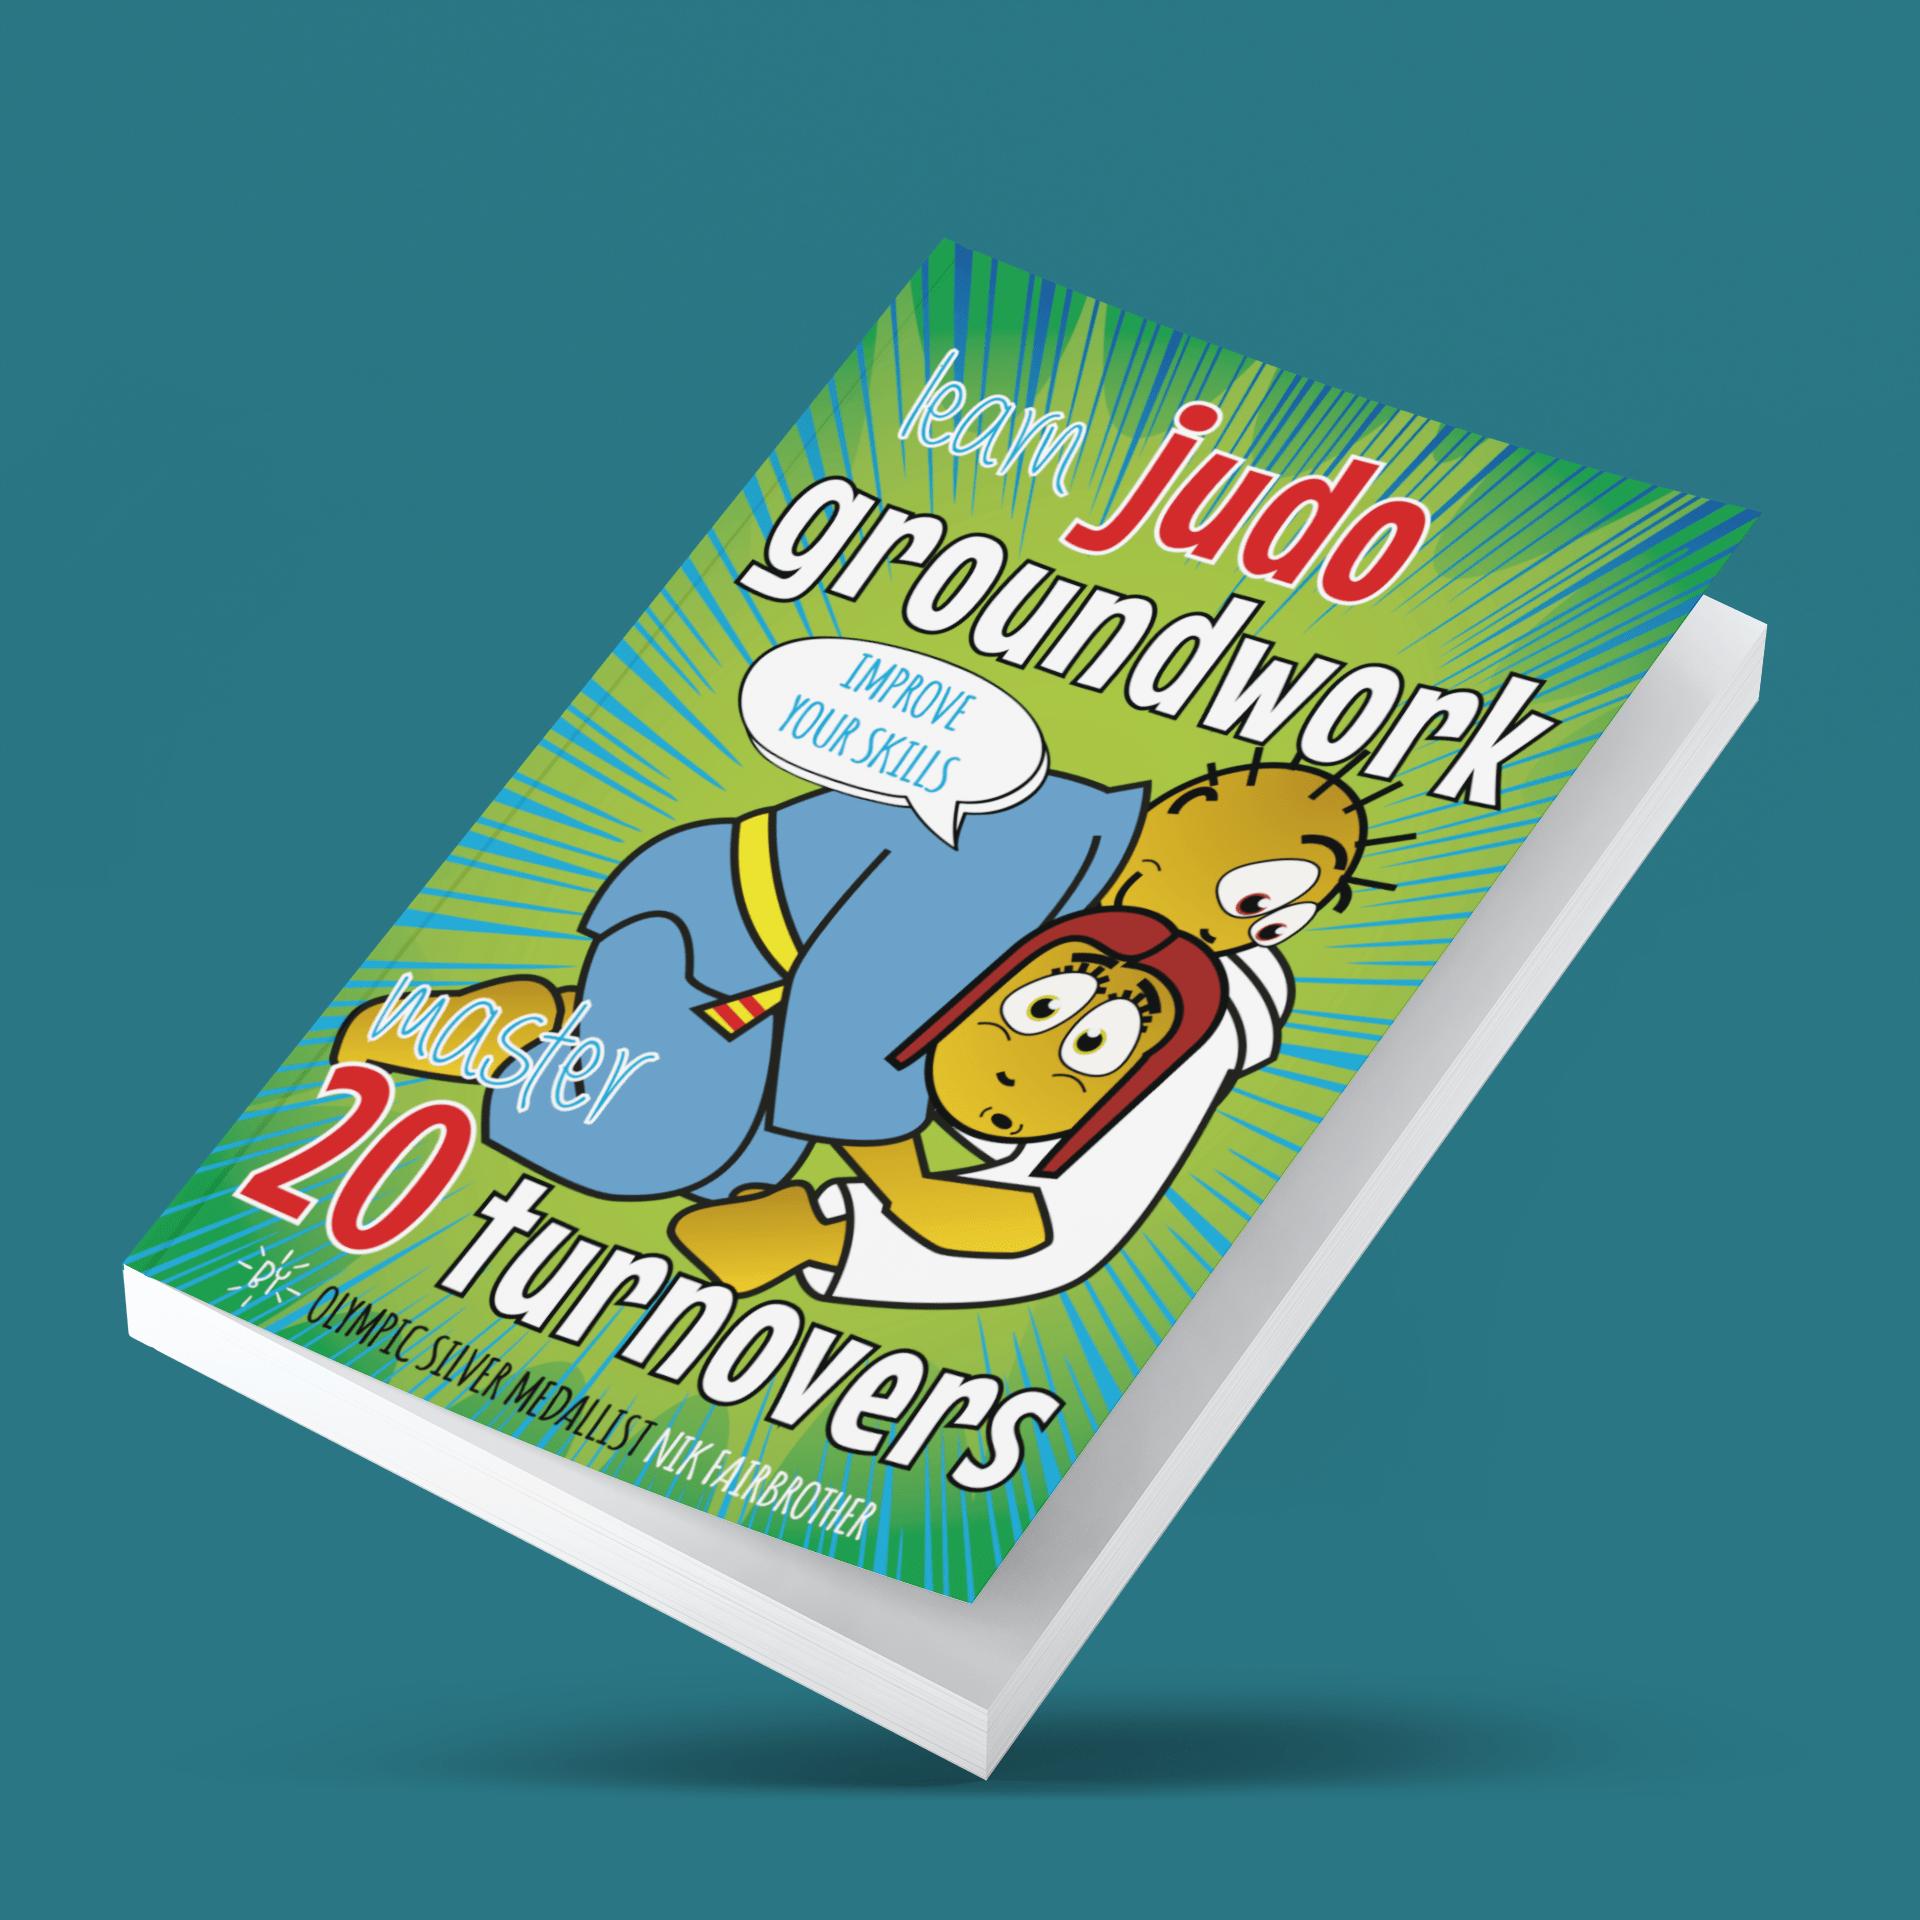 Judo Groundwork book for Kids